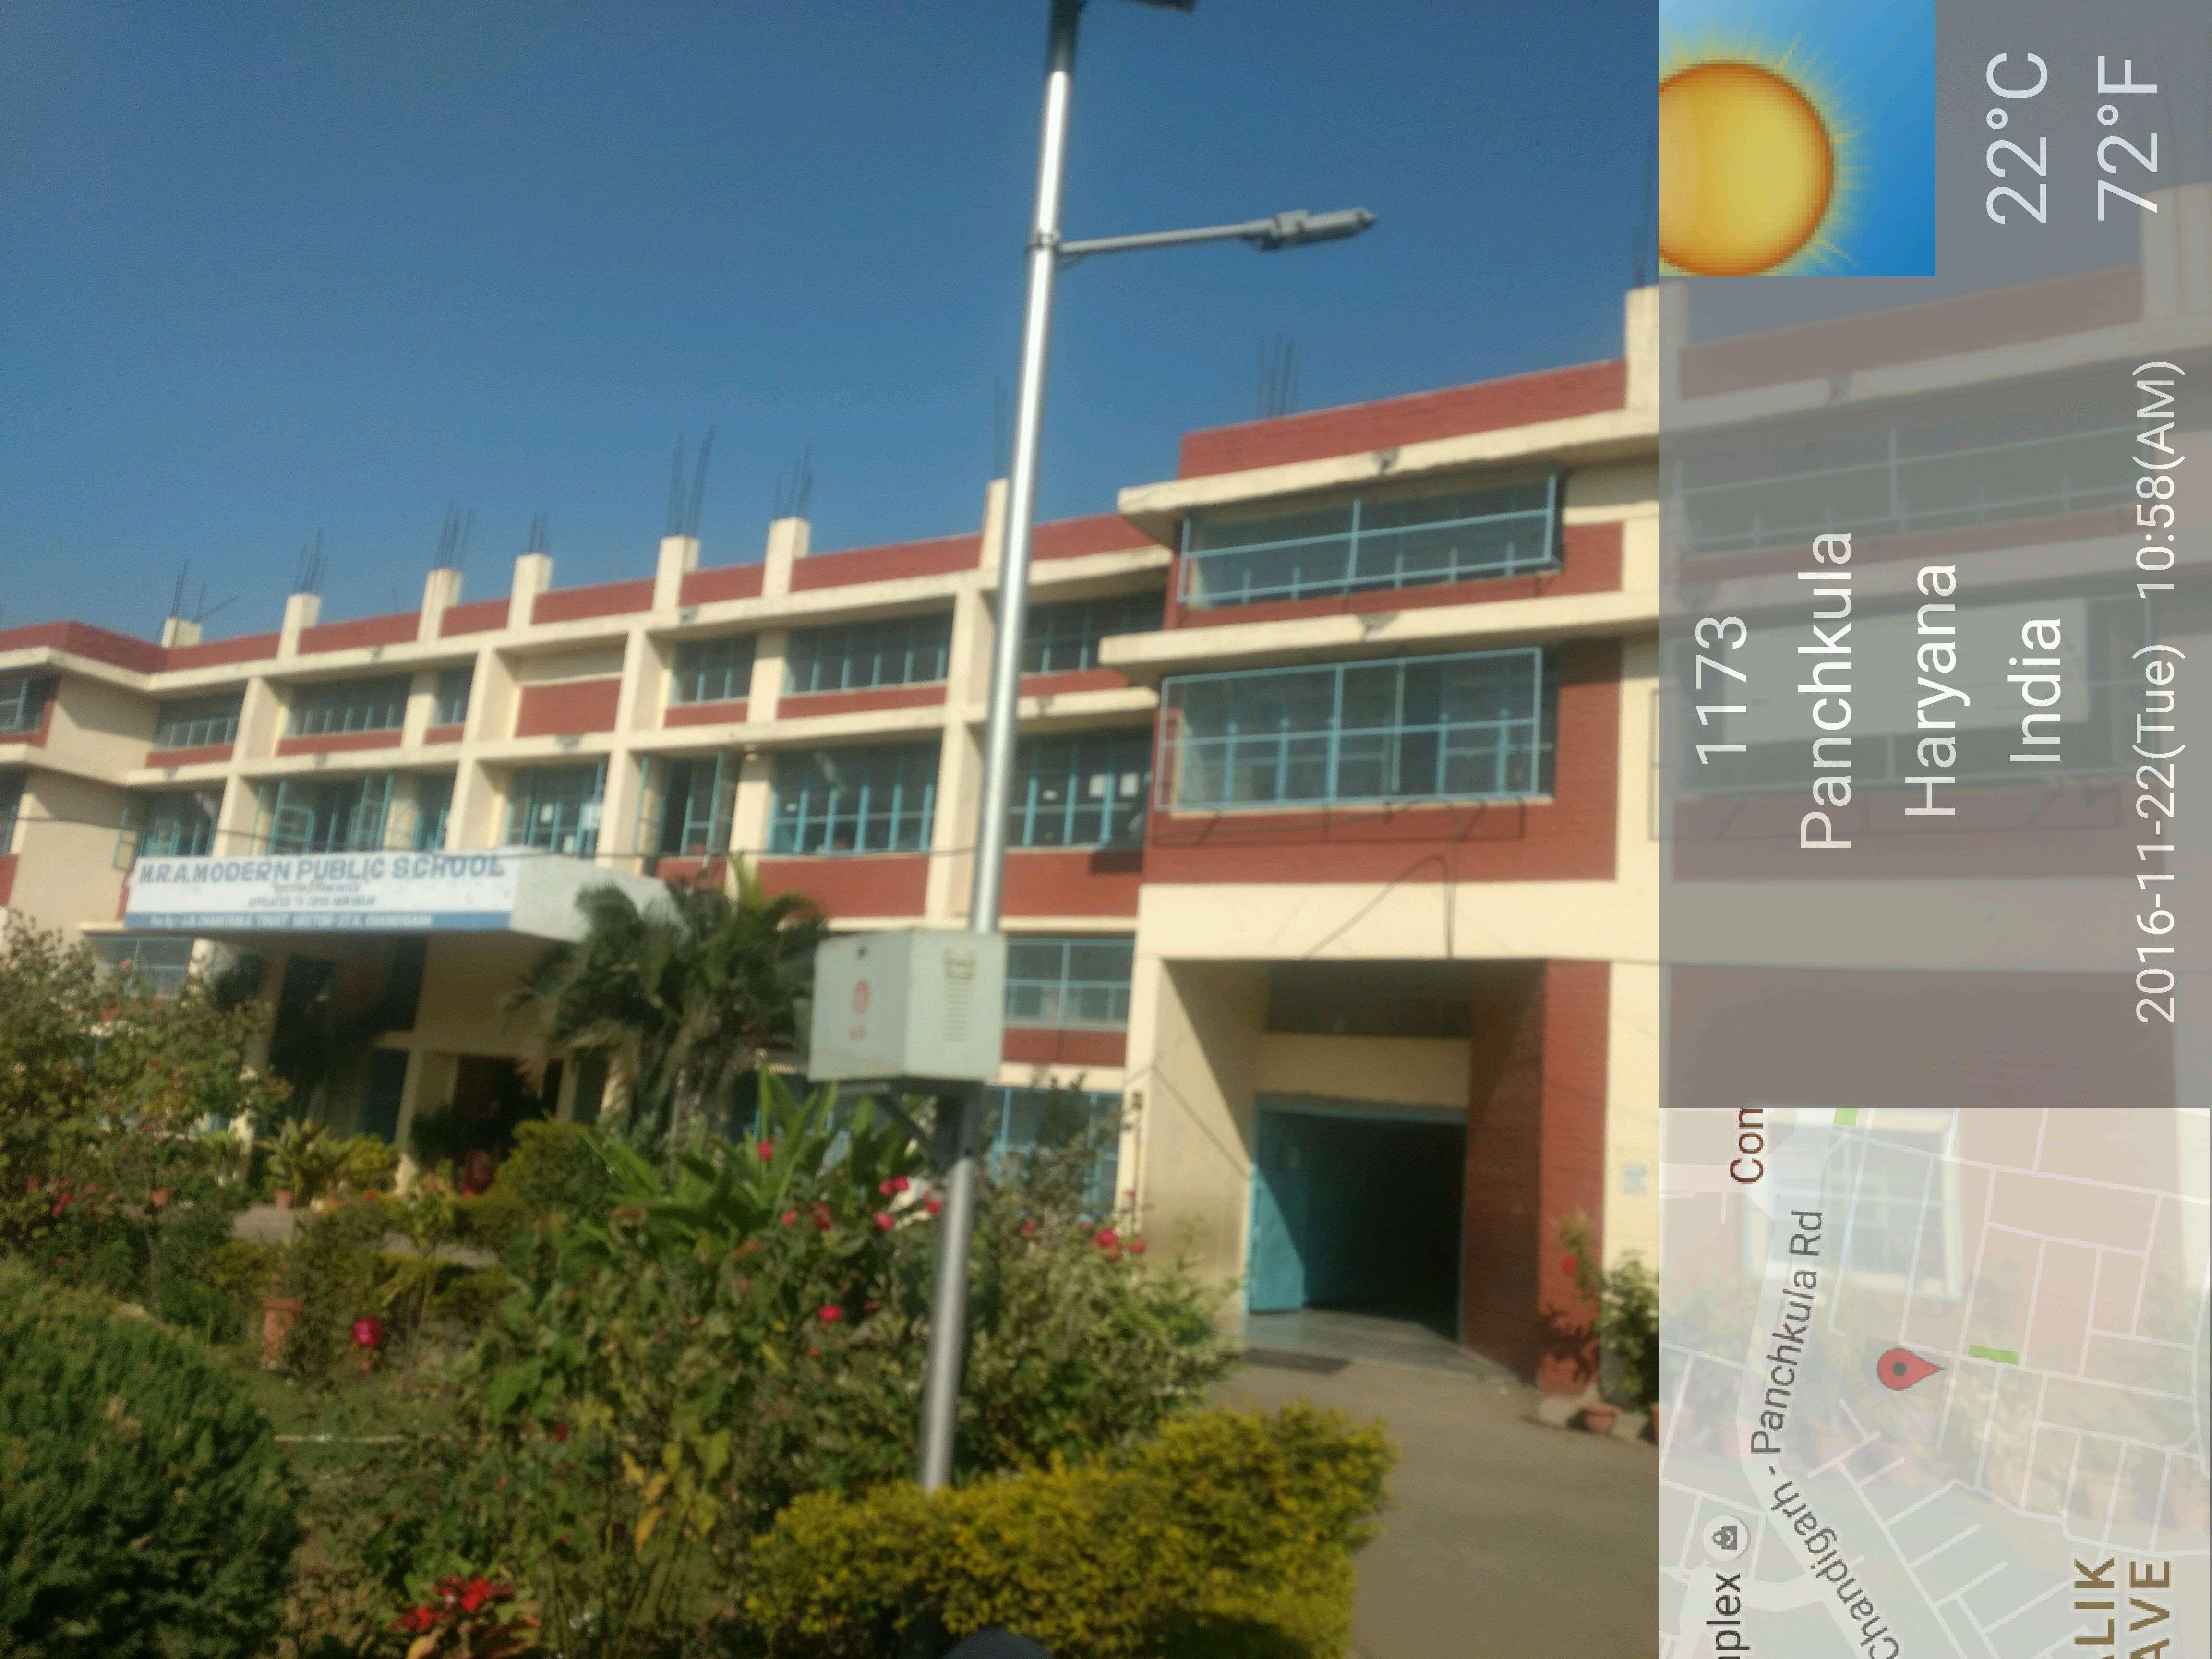 MOTI RAM ARYA MODERN PUBLIC SCHOOL SECTOR 7 PANCHKULA HARYANA 530076